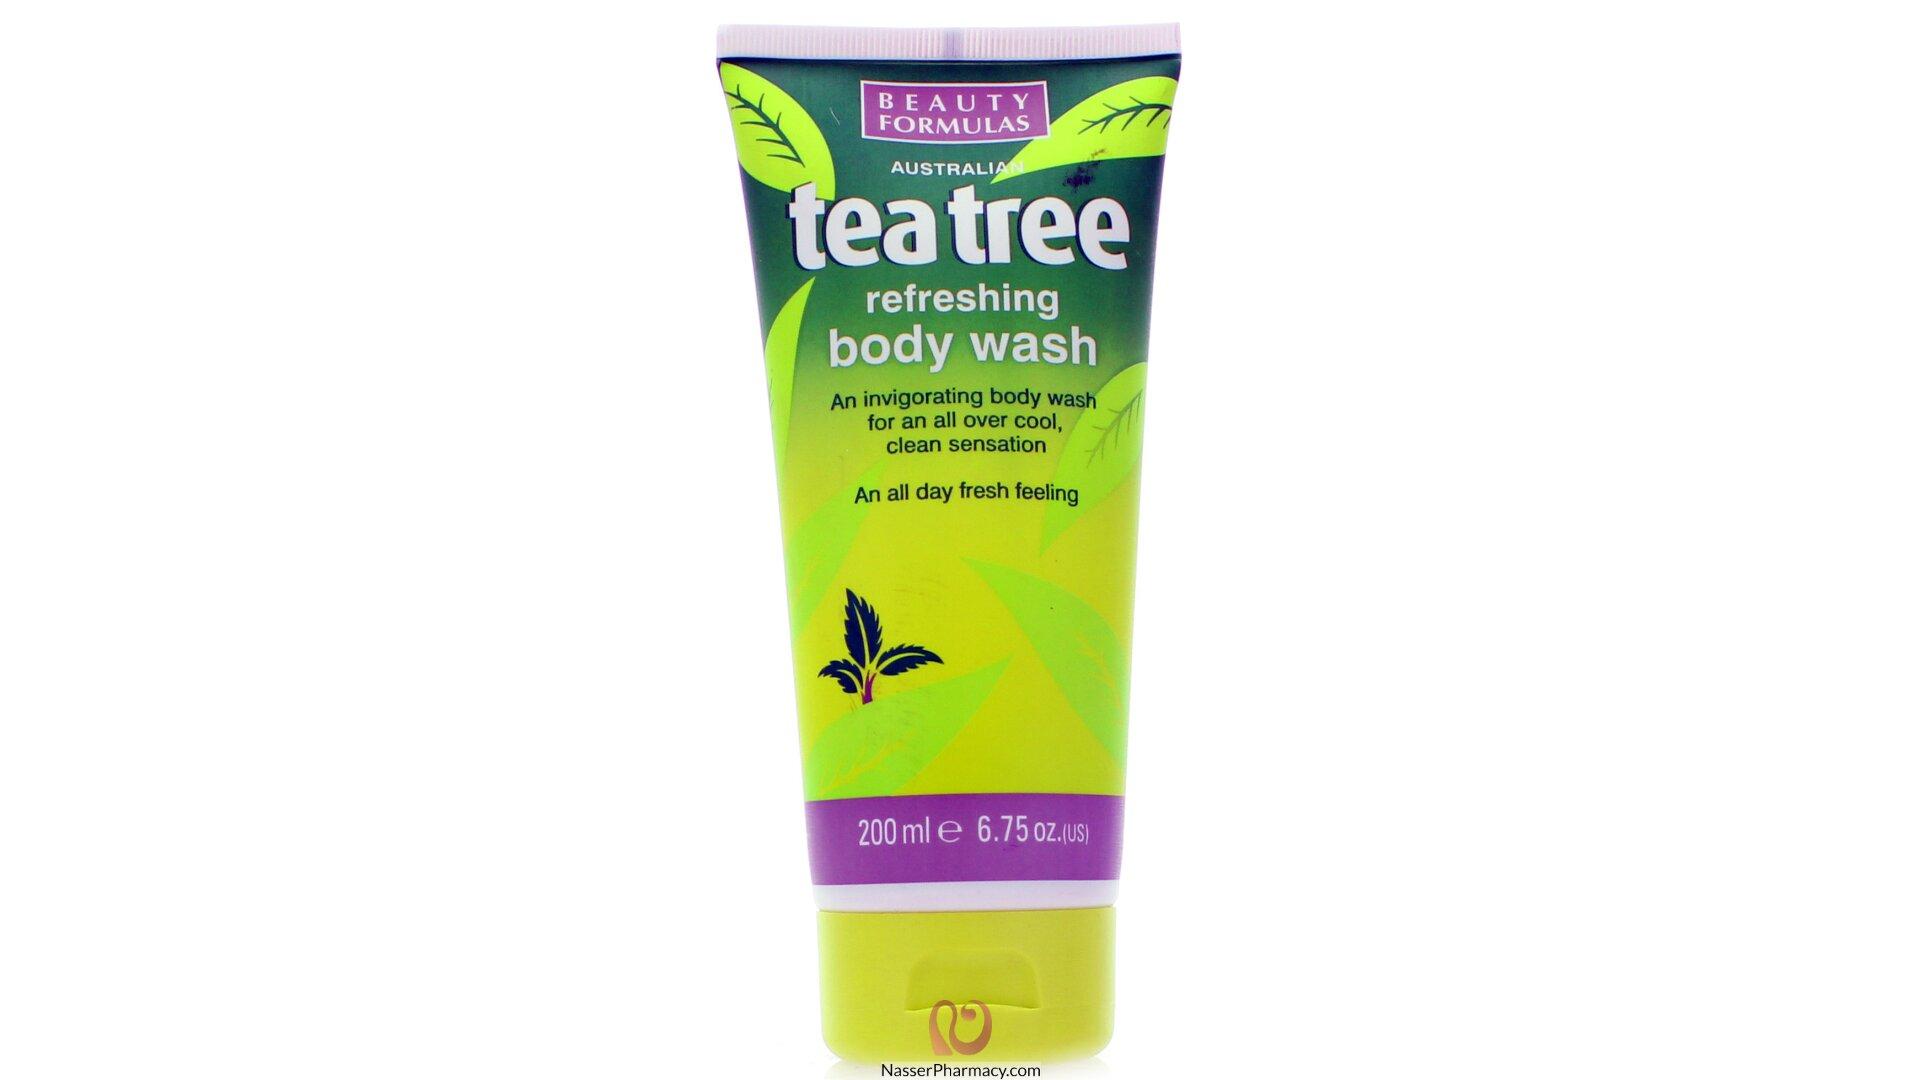 Velvy Tea Tree Oil Shower Gel Calendula Chamomile Romance Dream Essential Minyak Sari Reo 08 Beauty Formulas Refreshing Body Wash 200ml